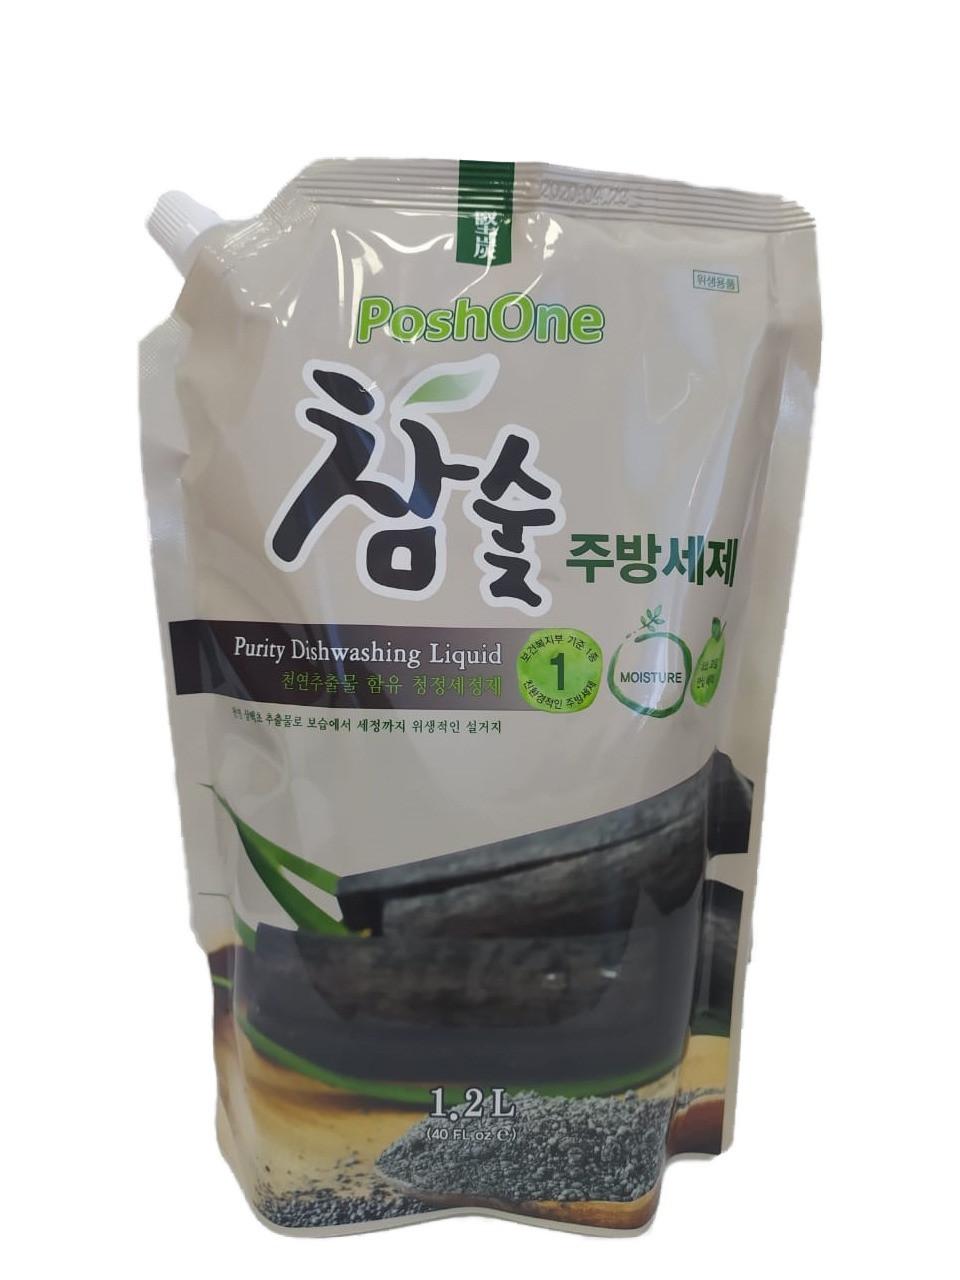 Poshone Средство для мытья посуды с древесным углем Charcoal Purity Dishwashing Liquid / 1200 мл.